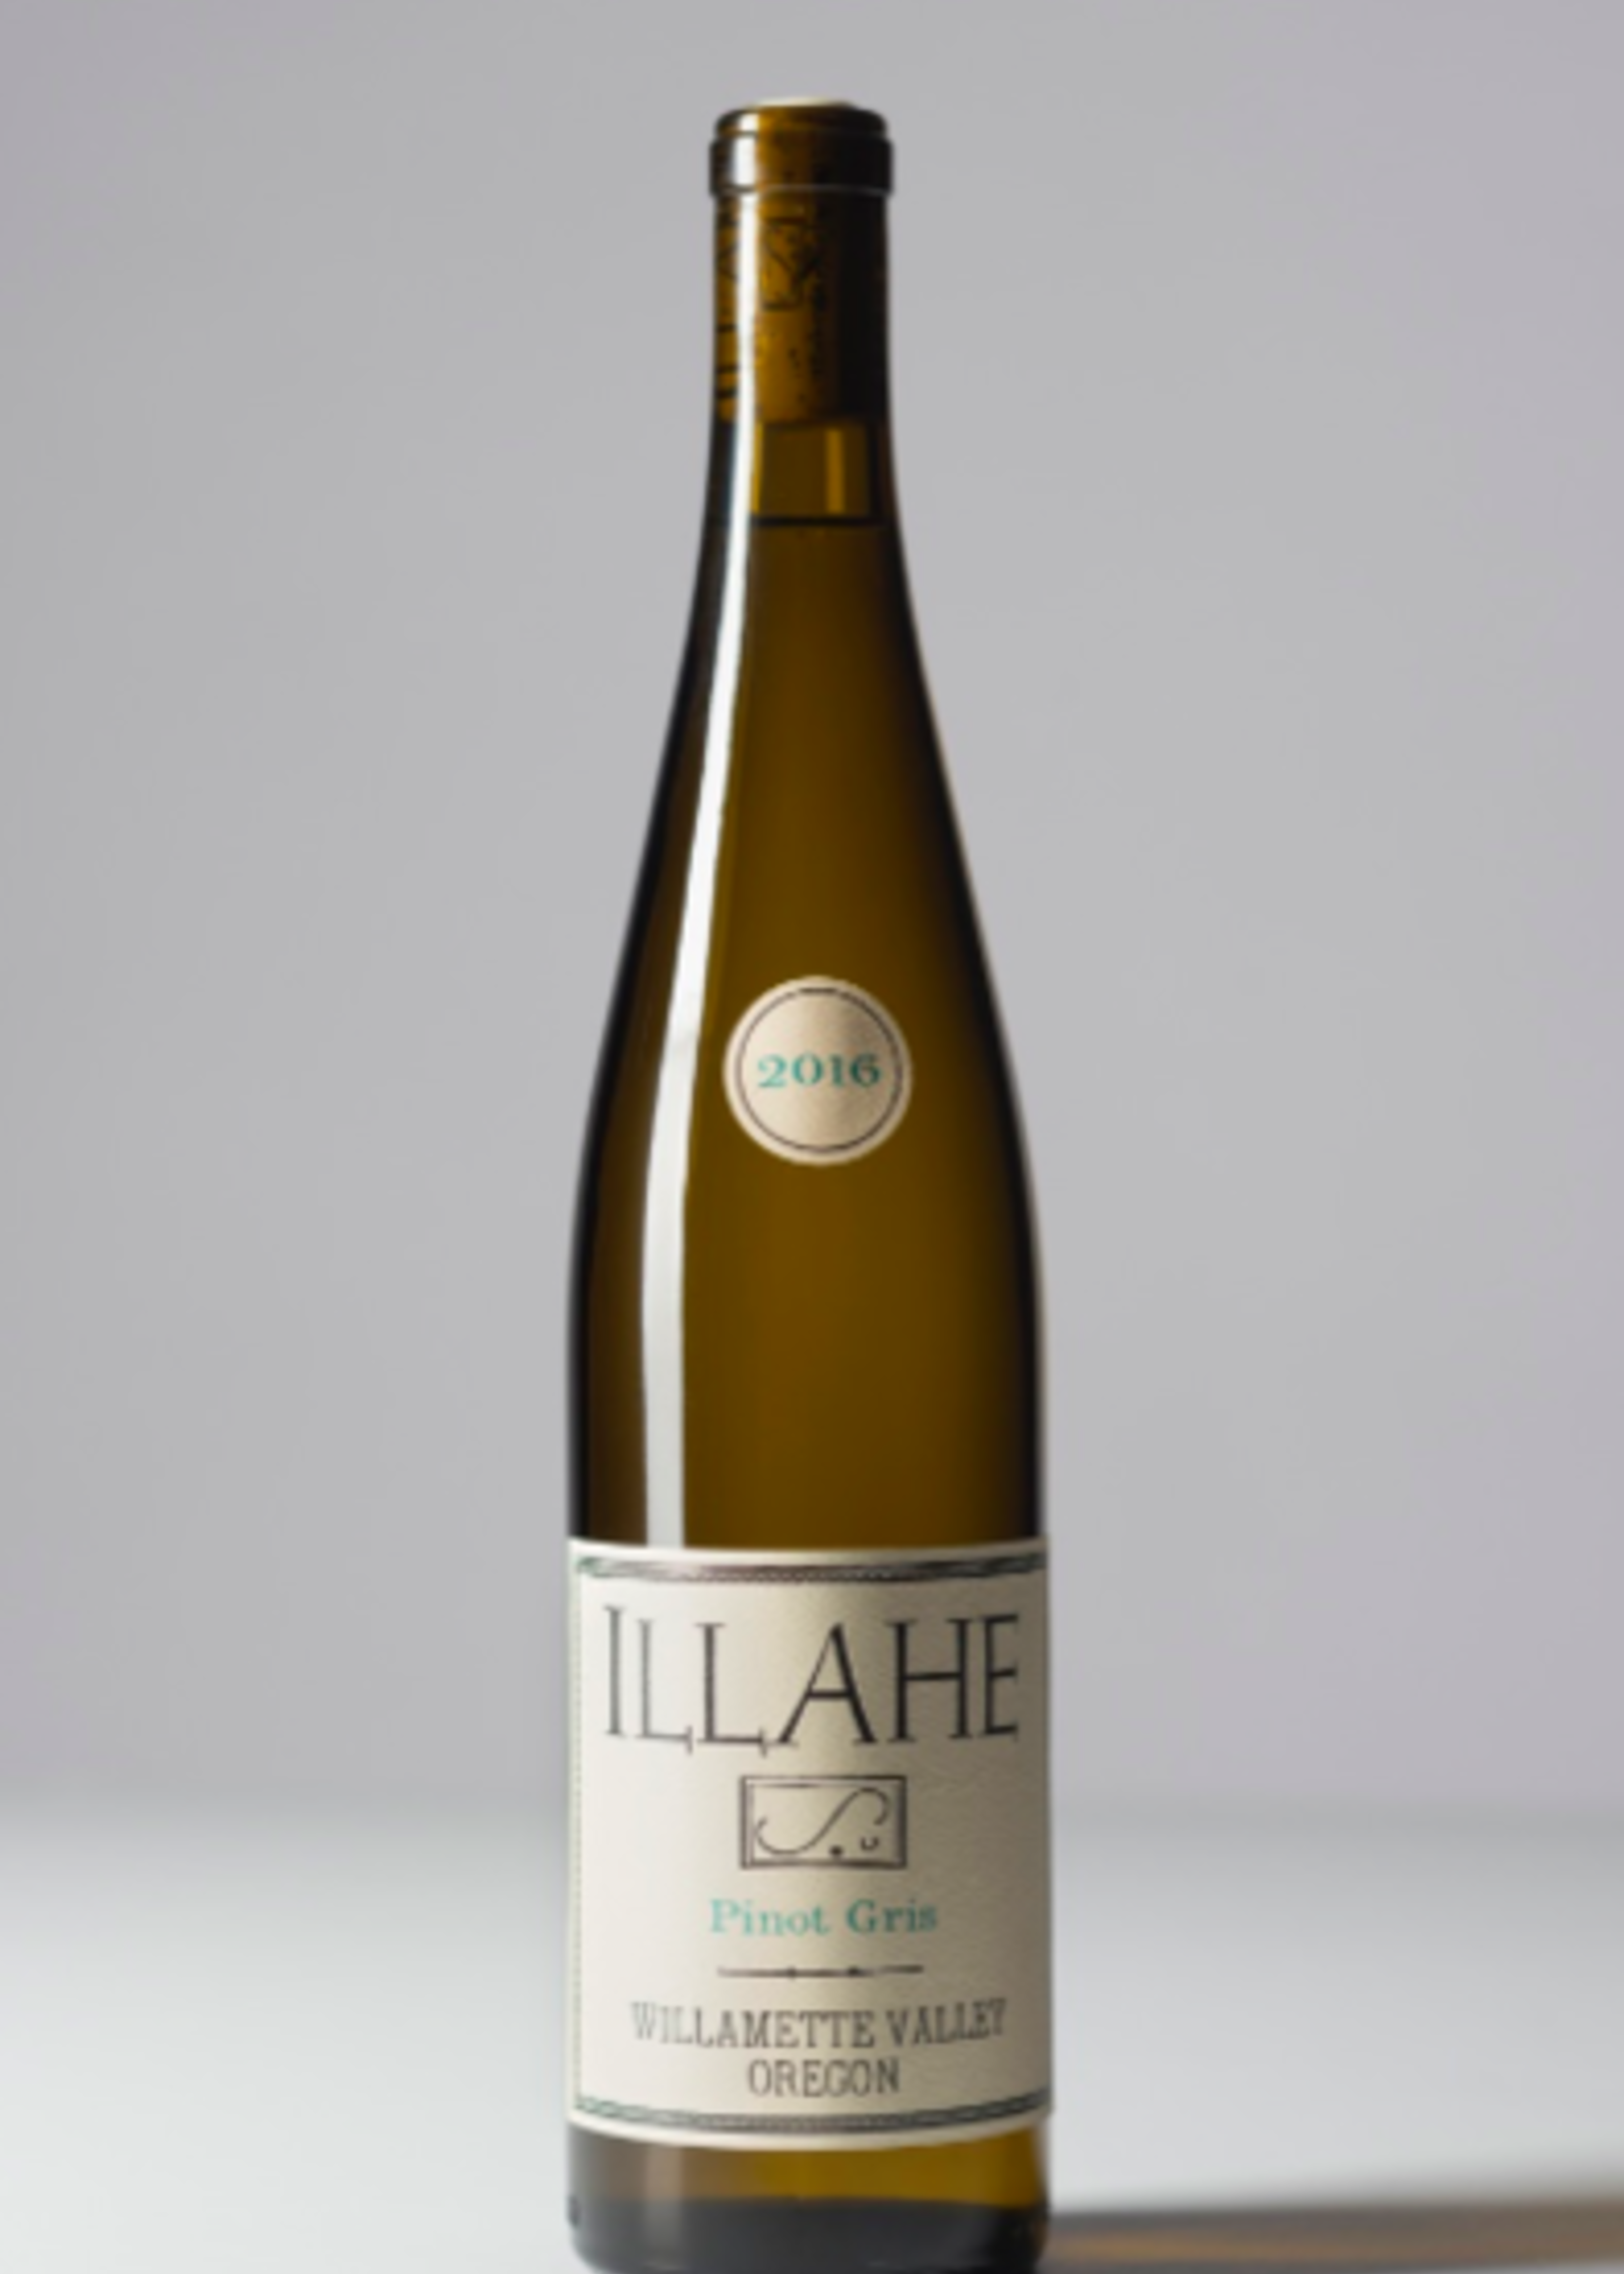 Illahe Pinot Gris